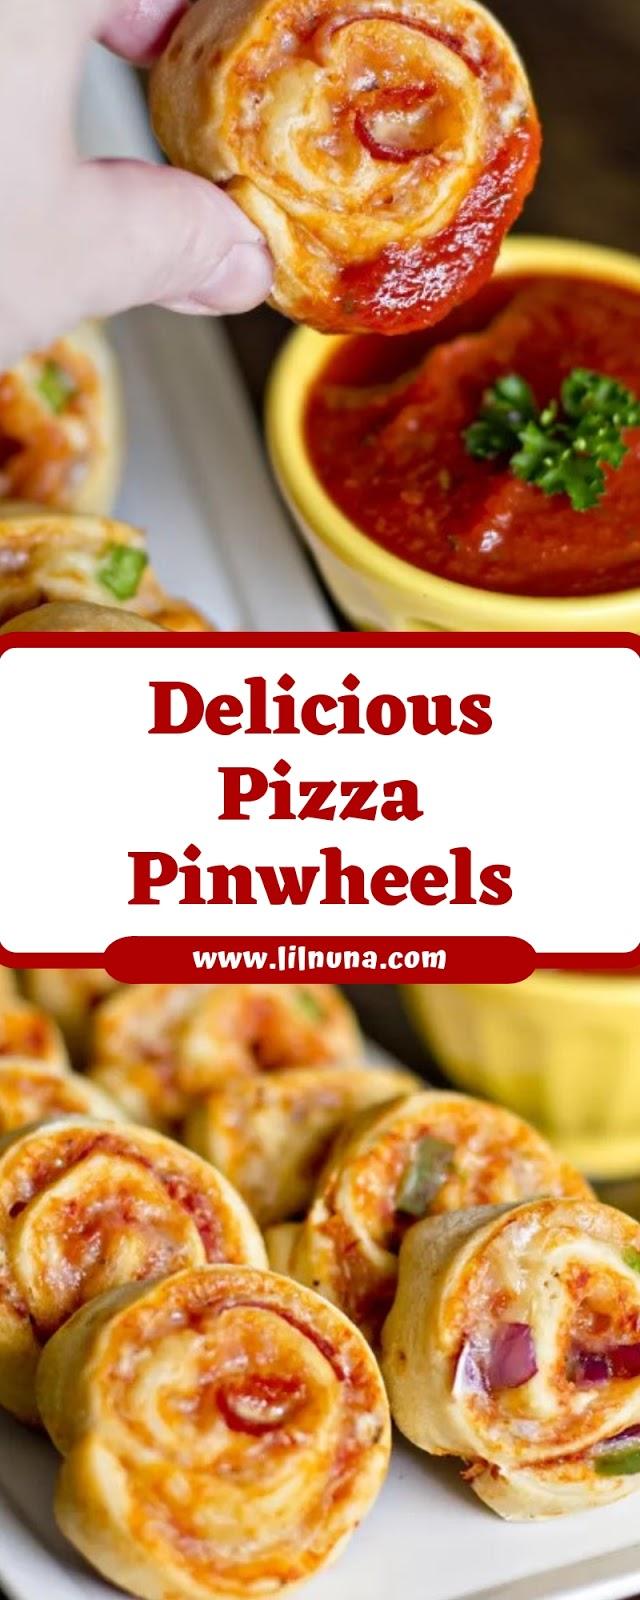 Delicious Pizza Pinwheels